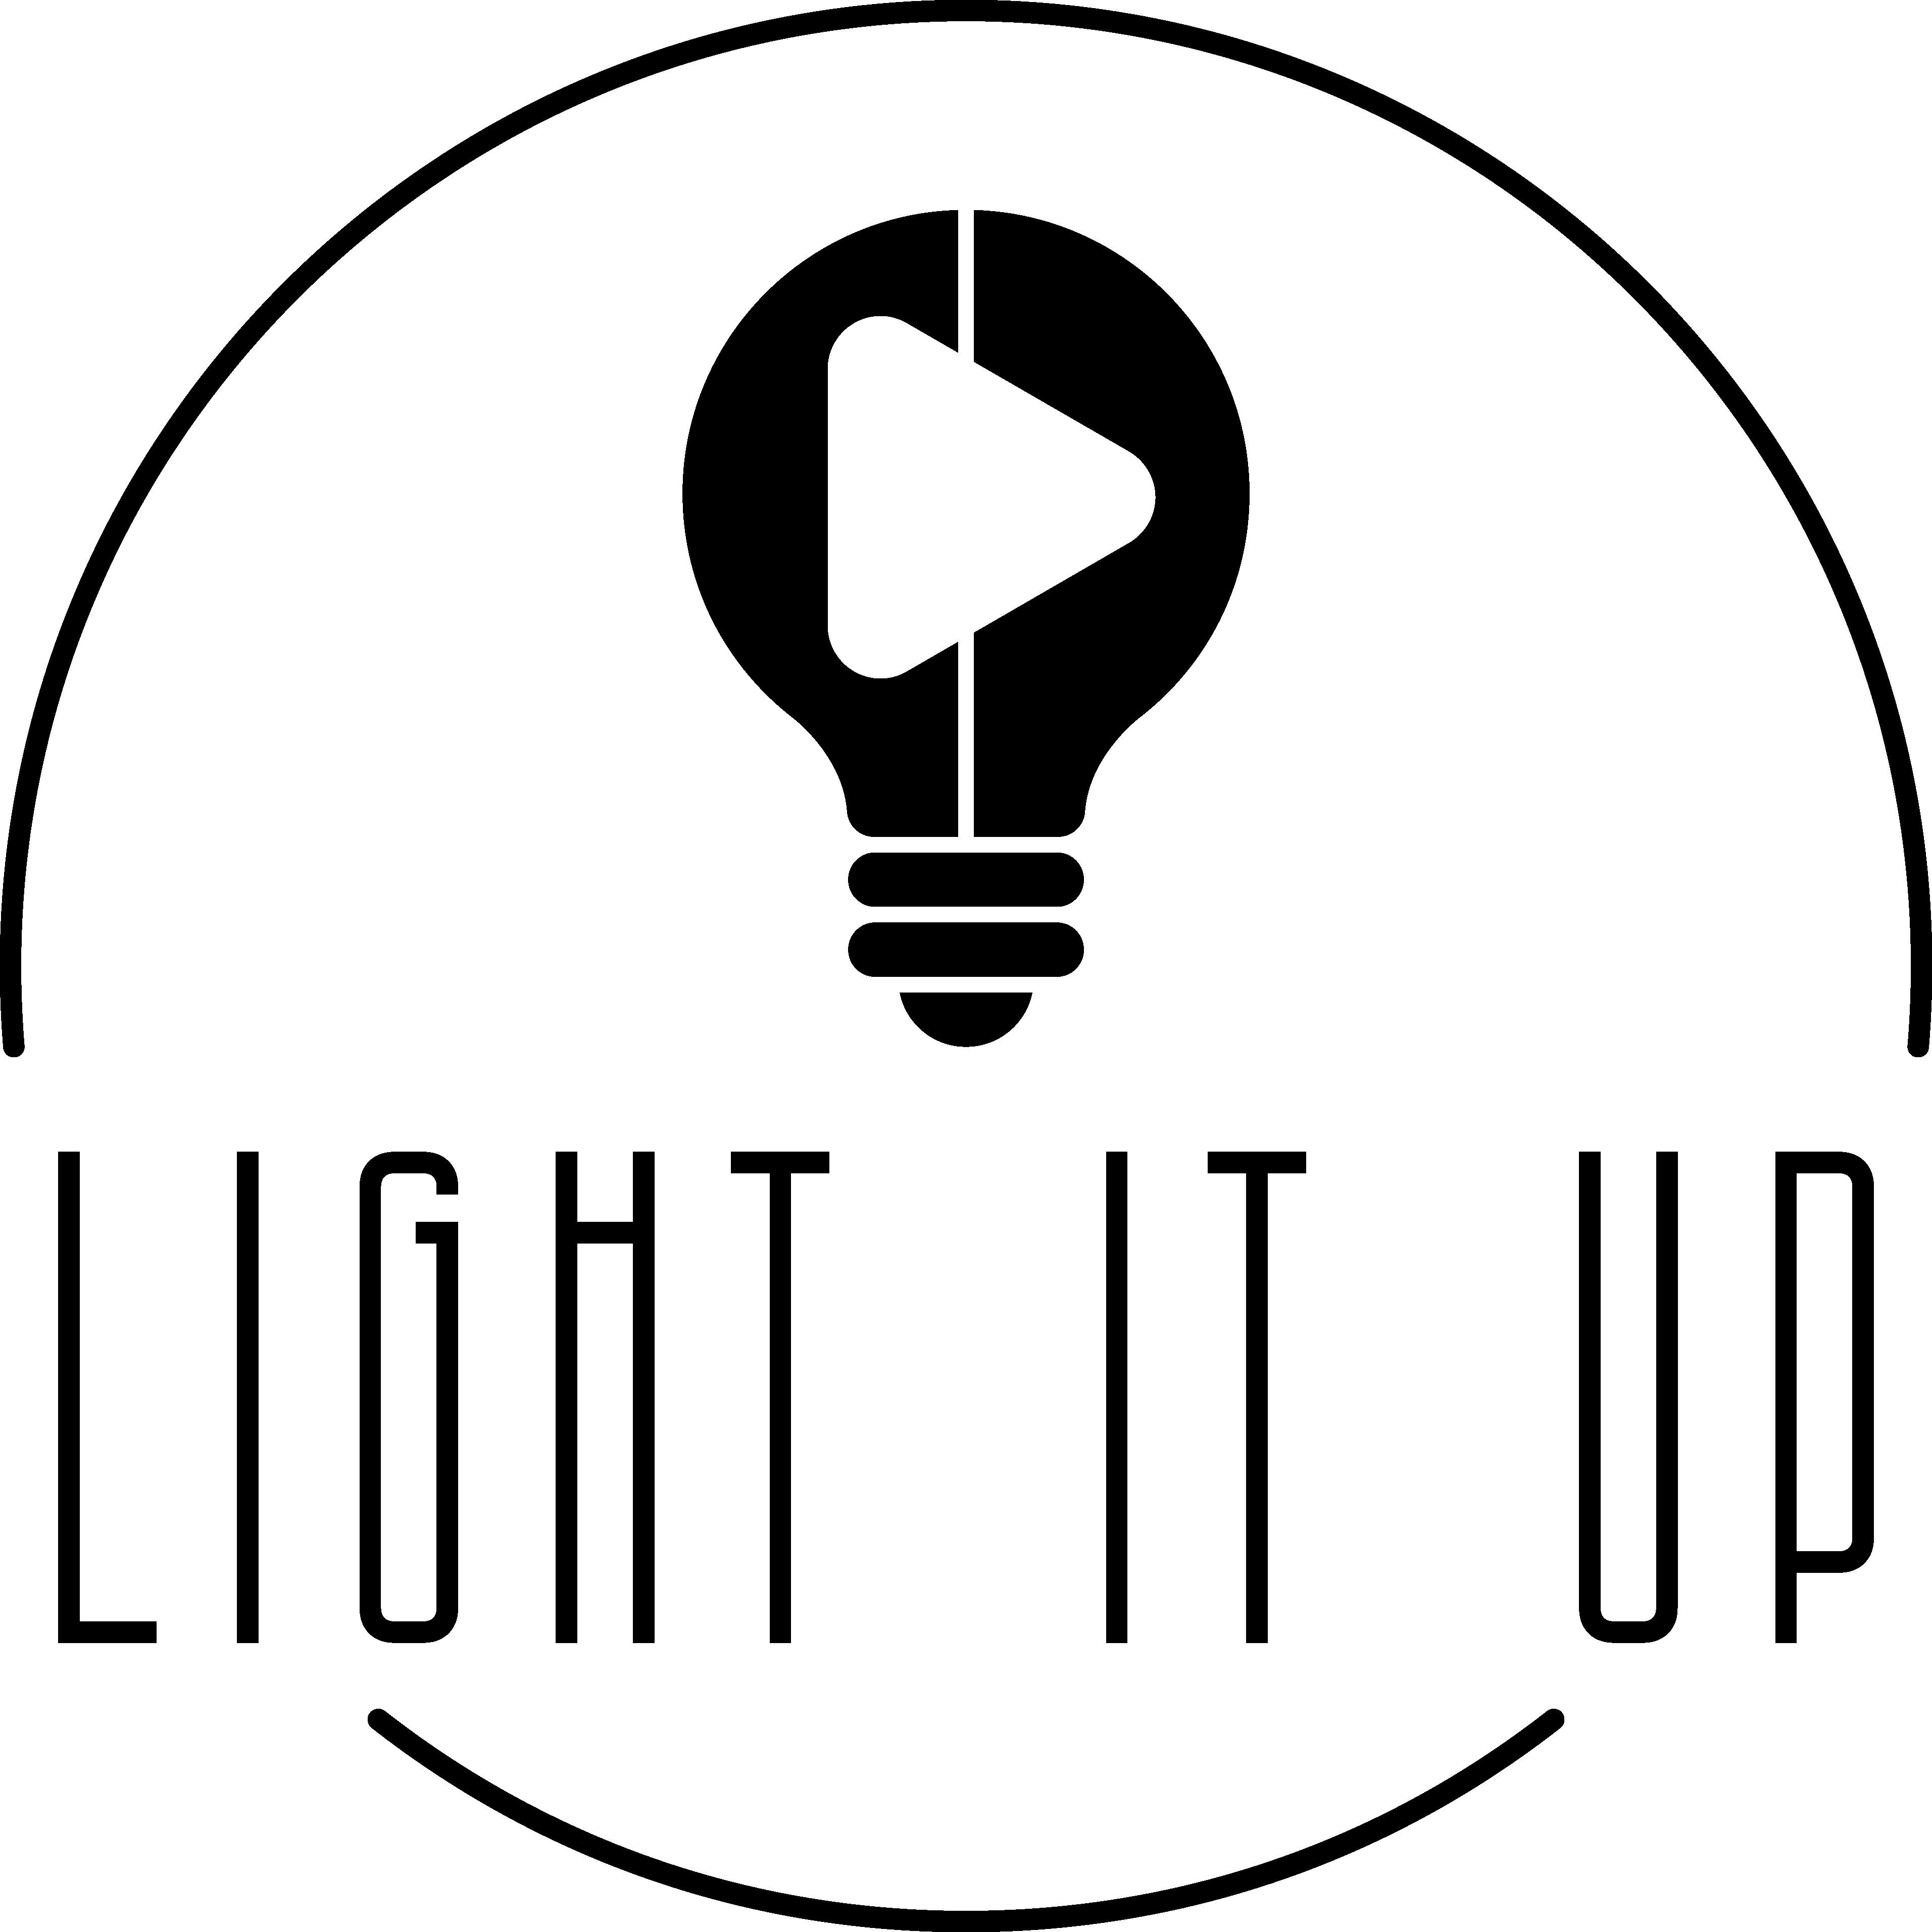 1 logo black png